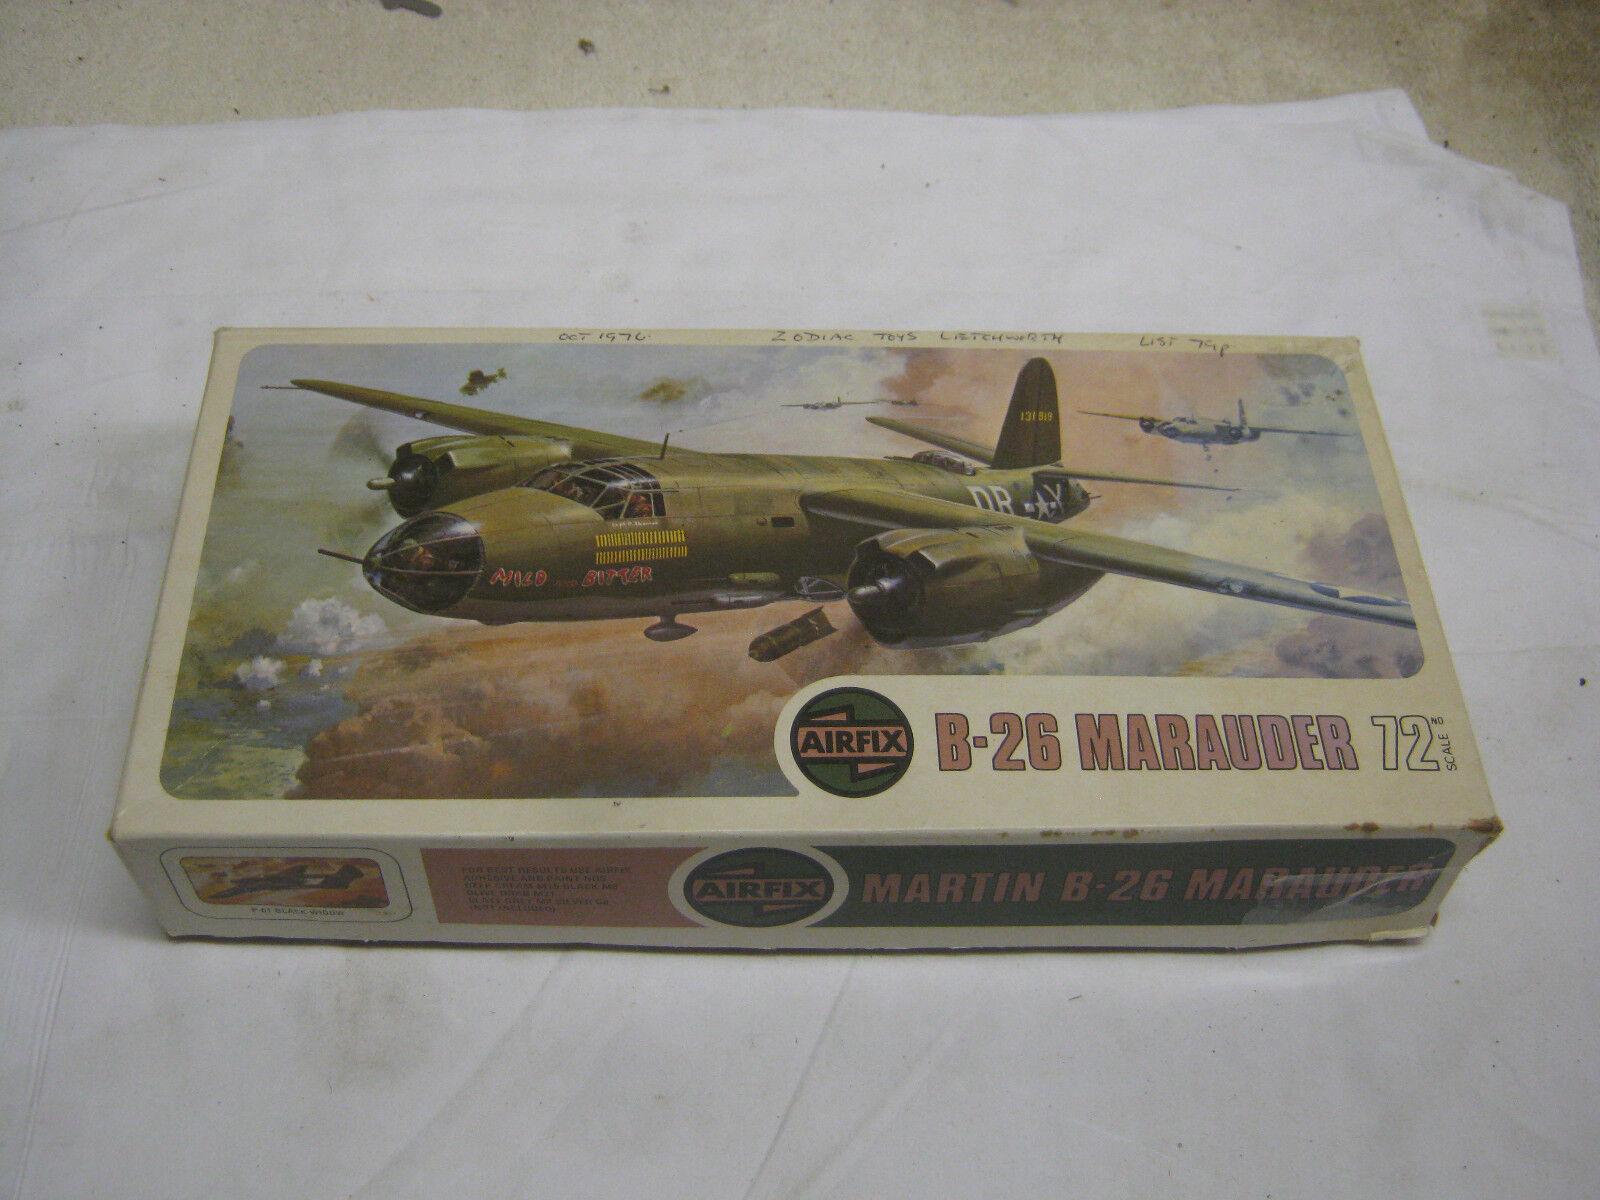 VINTAGE AIRFIX 1 72 B-26 MARAUDER WITH DISPLAY STAND KIT NO.495